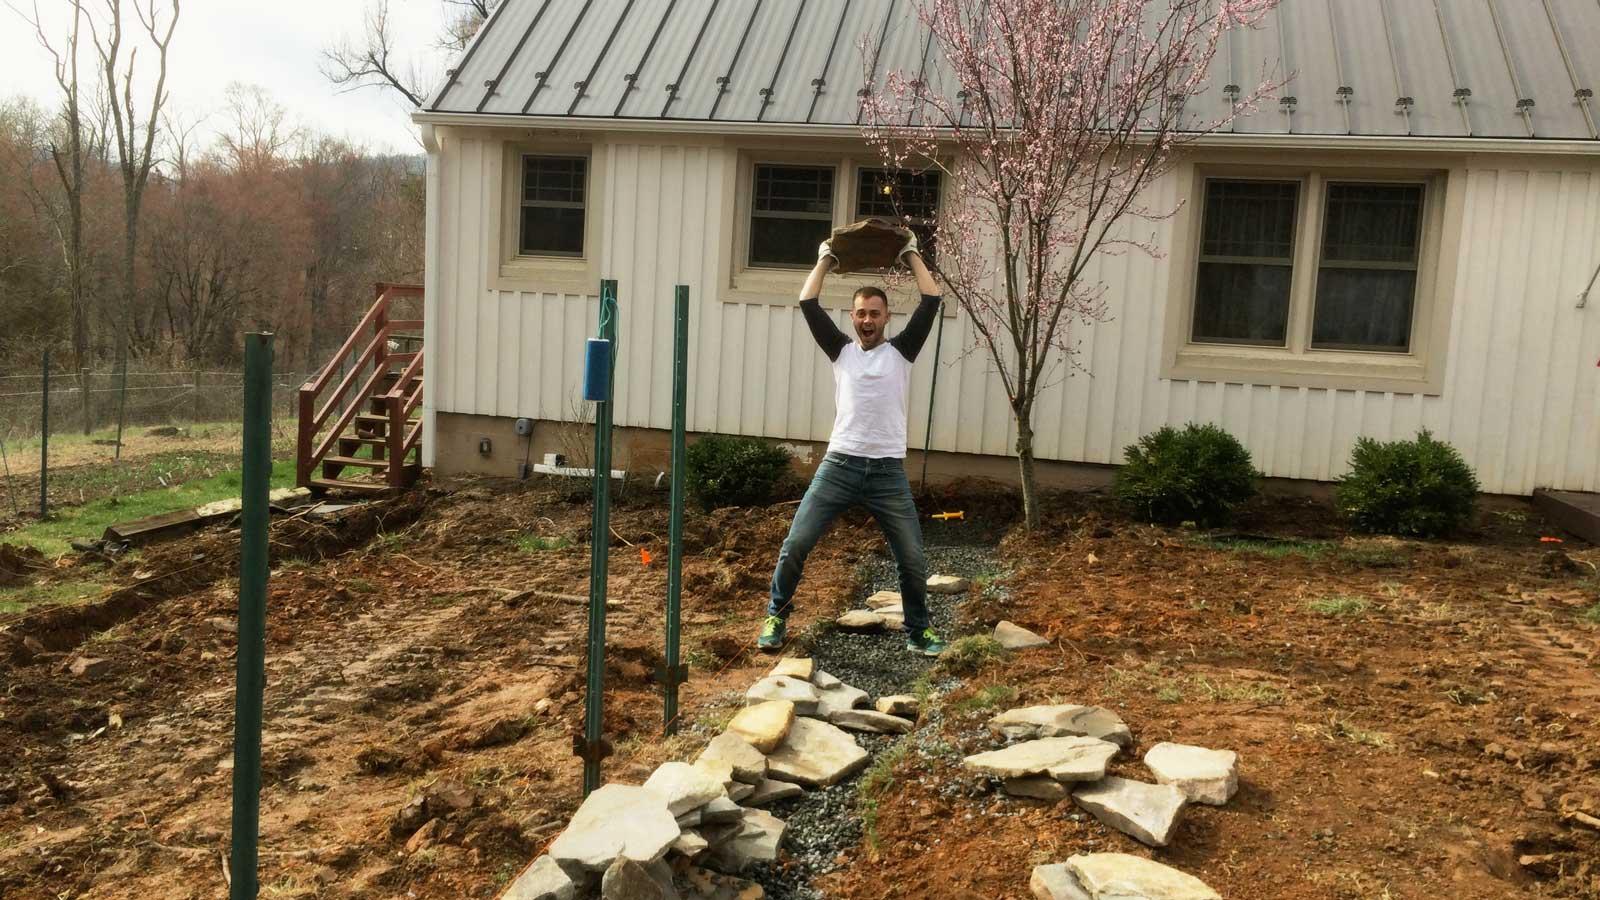 Sean Lifting Rocks